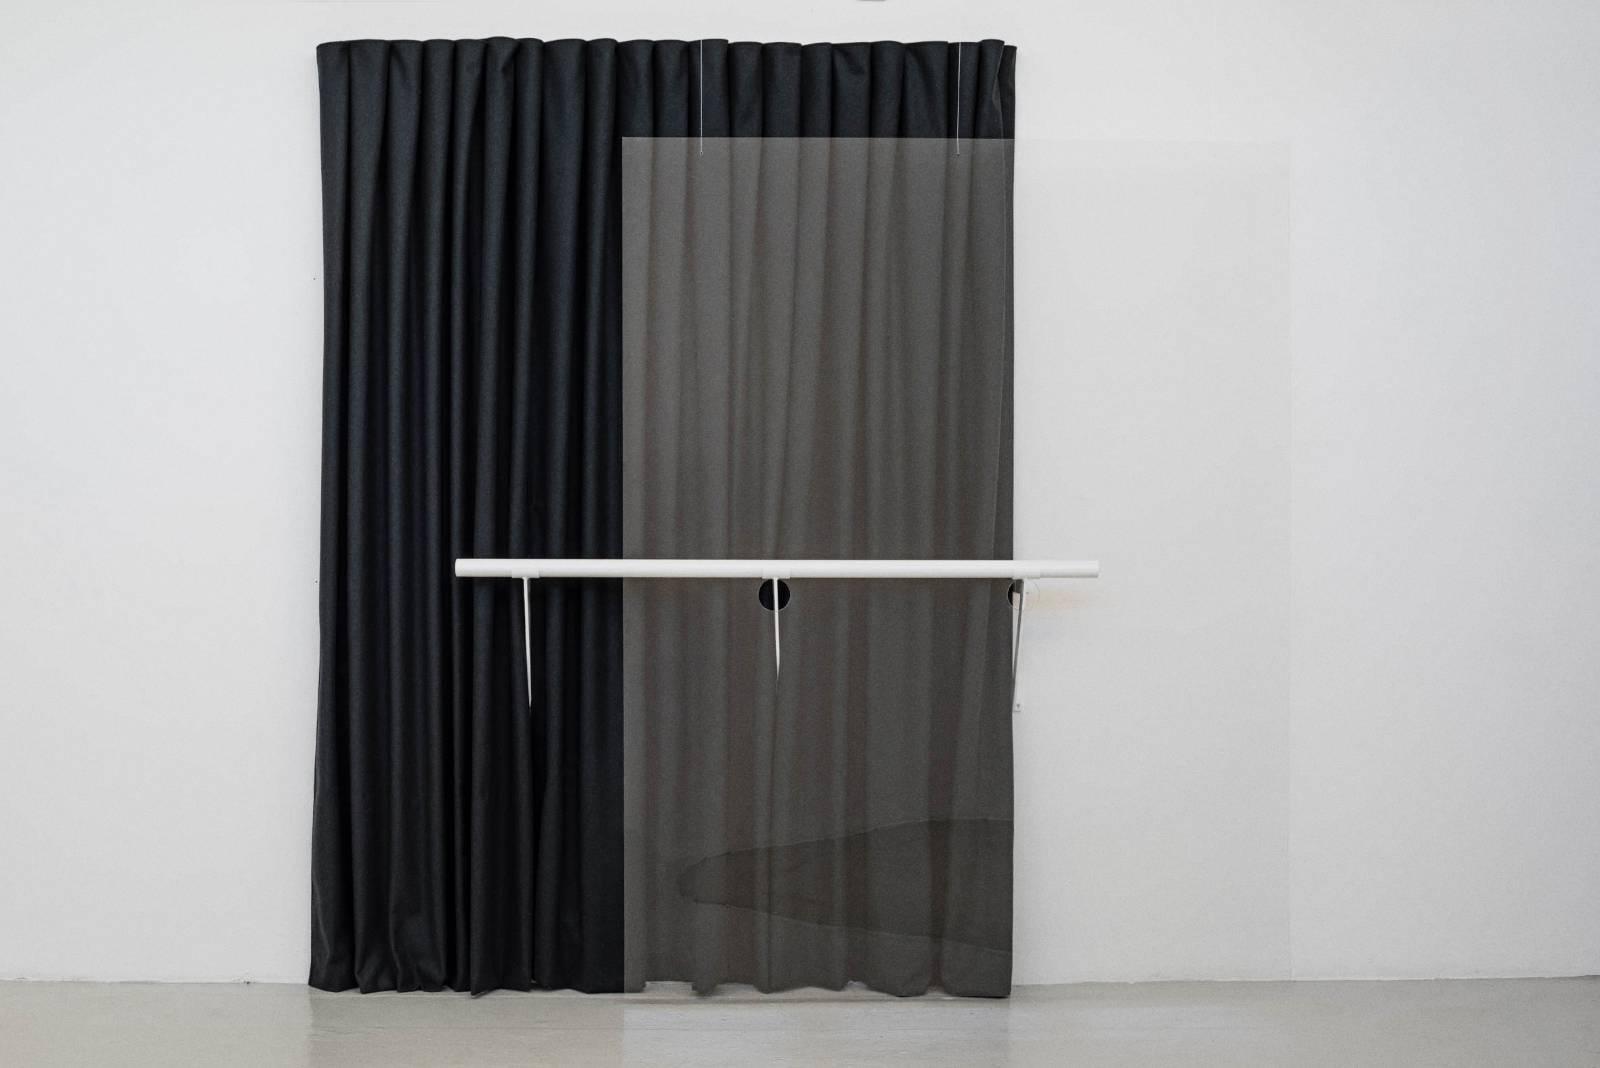 Composition, 2015, fabric, plexiglass, corian